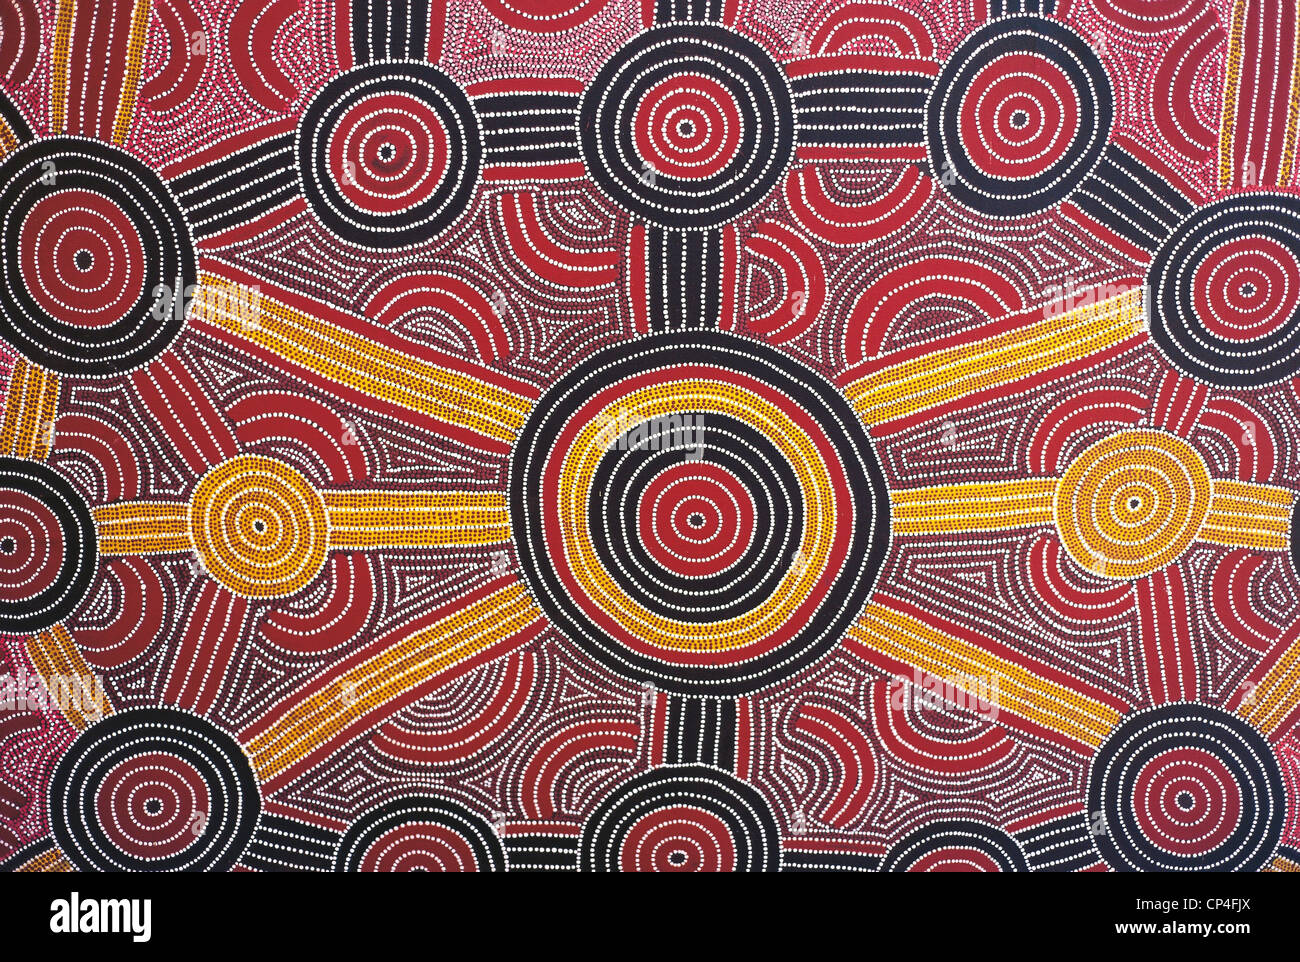 Australien - Uluru-Kata Tjuta National Park. Aborigines Malerei im Sheraton Hotel. Stockbild